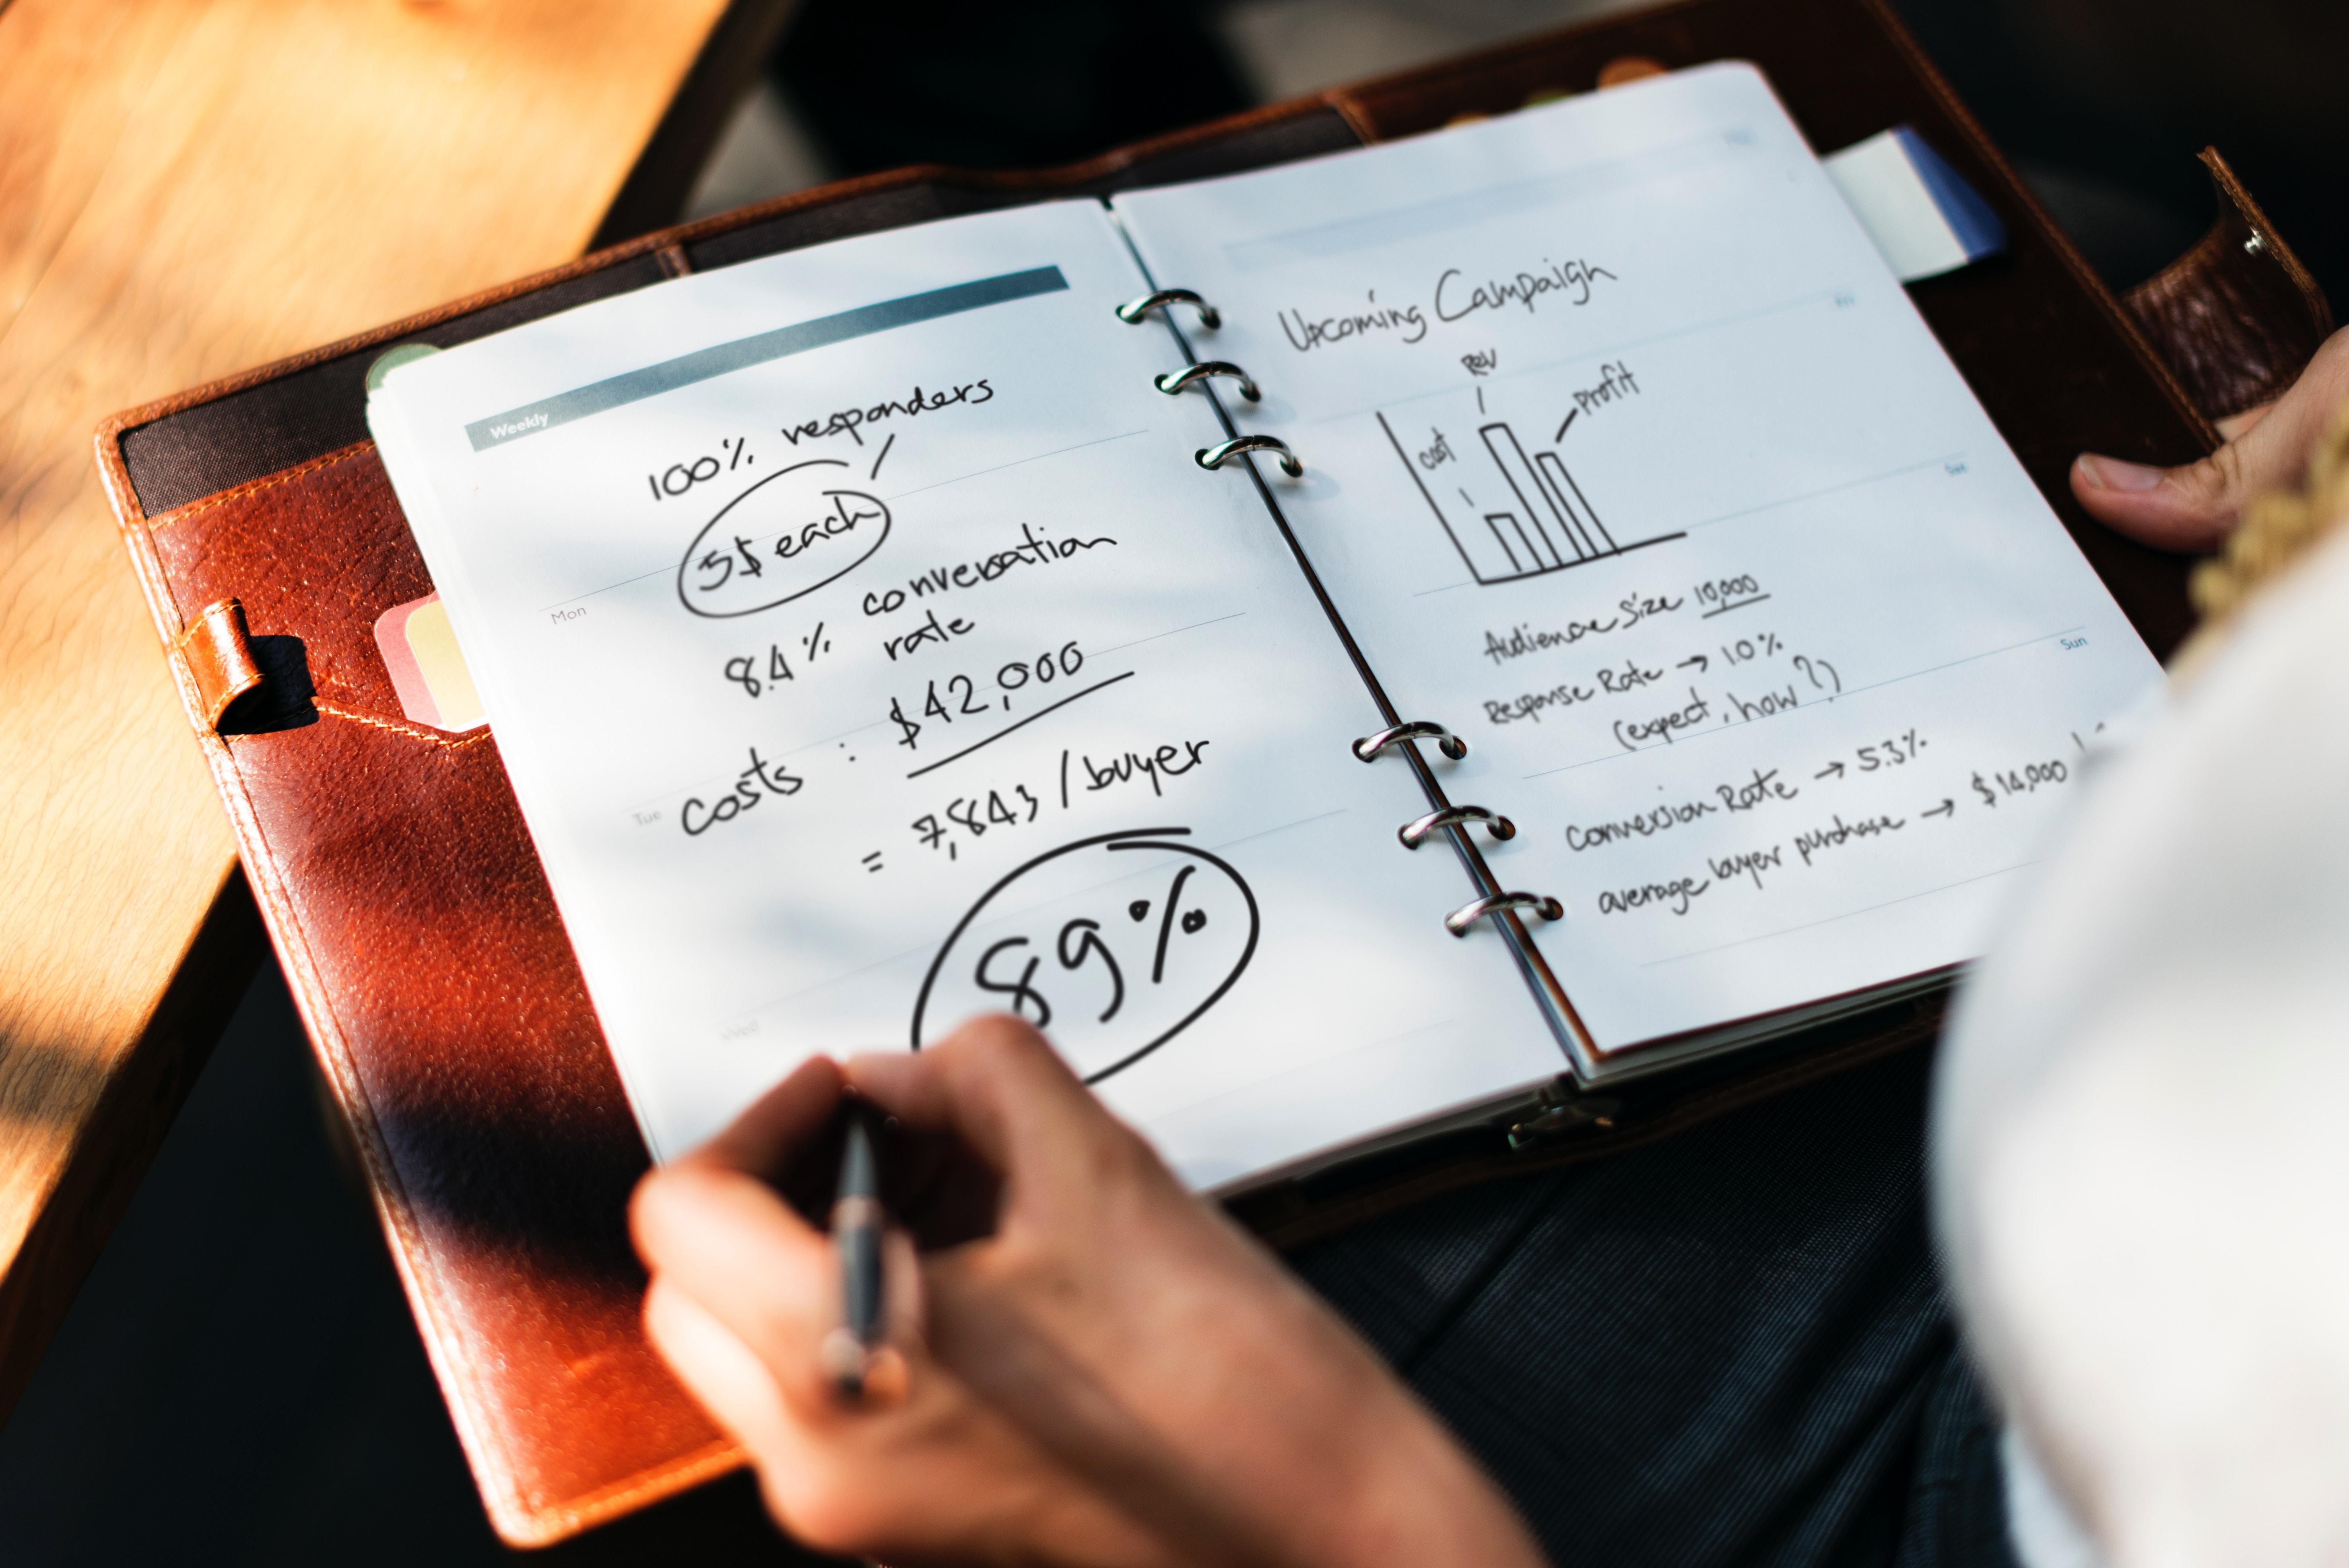 Activity analytics business plan 401683